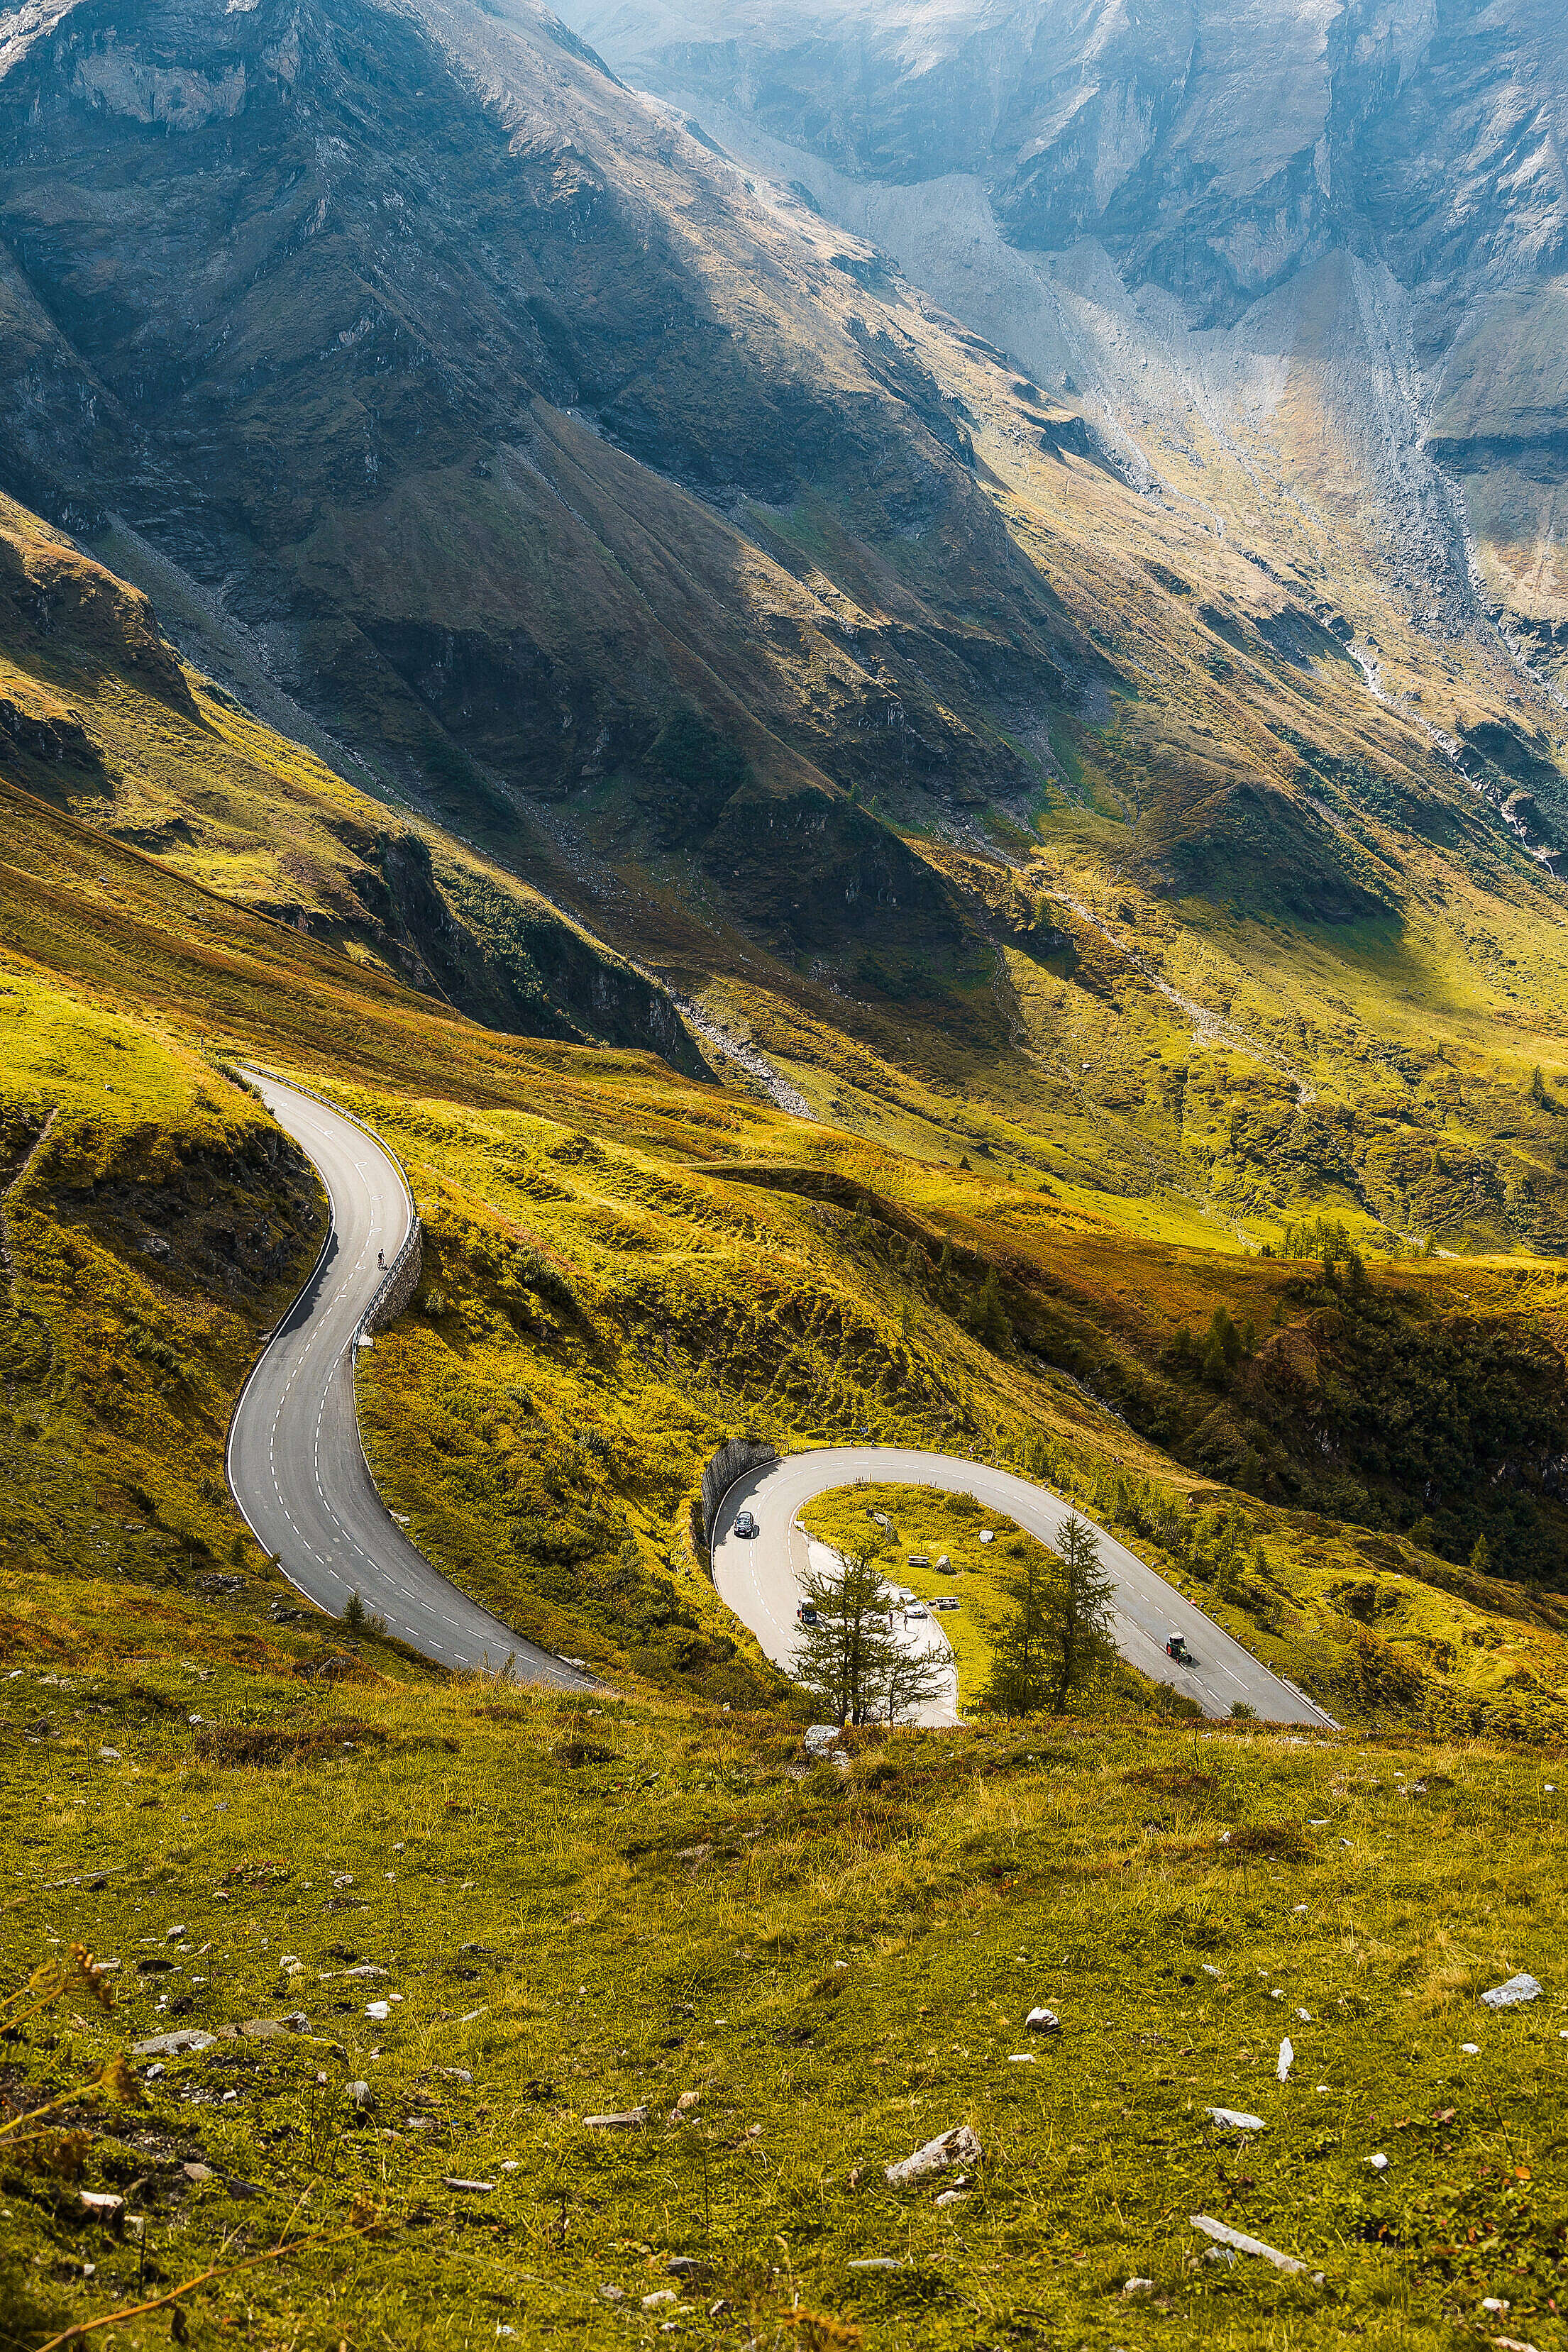 Dream Drive on Grossglockner Mountain Road Free Stock Photo